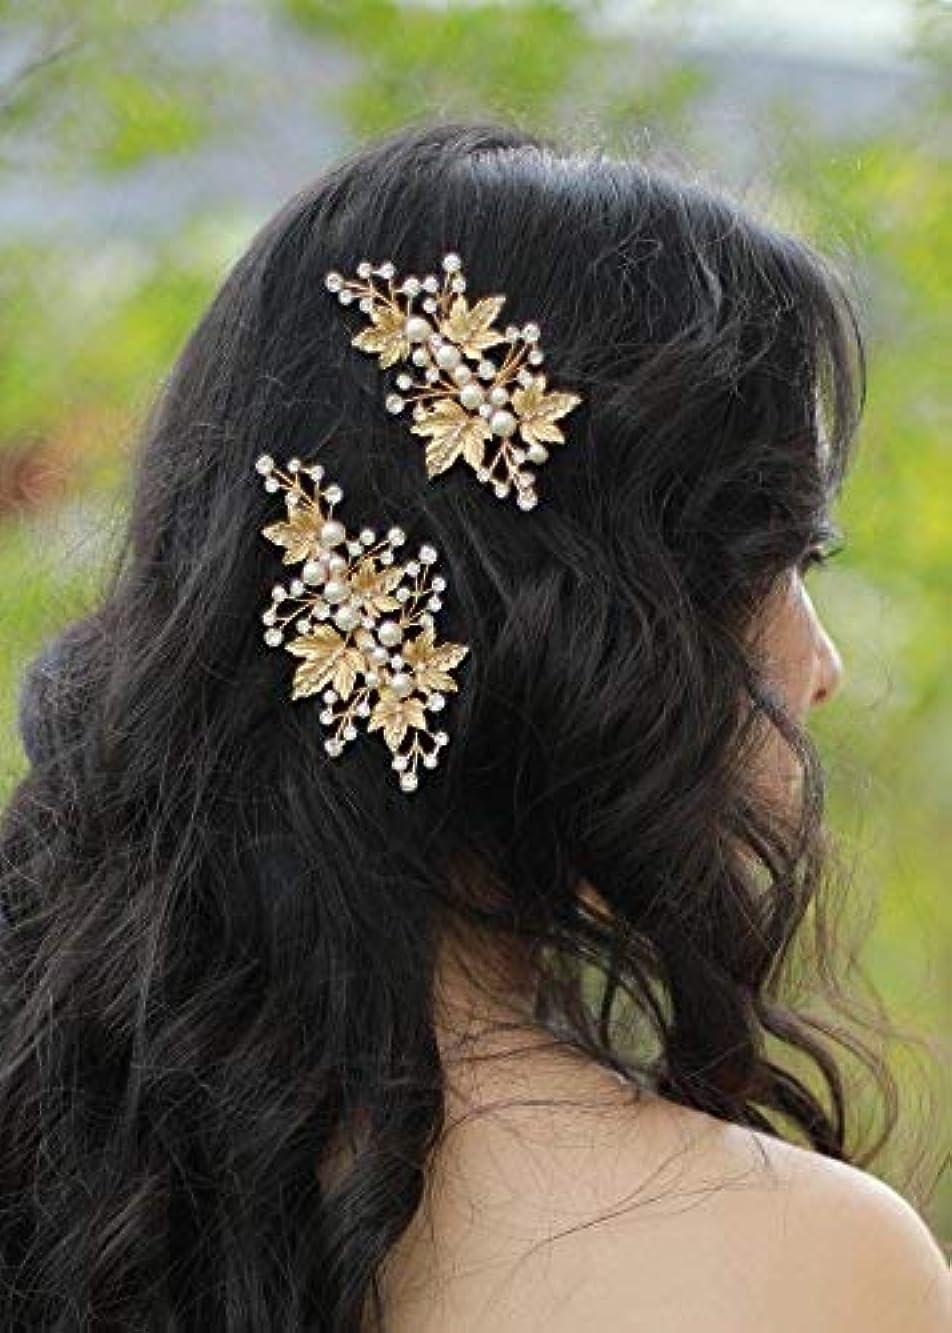 FXmimior Bridal Vintage Hair Comb Women Vintage Wedding Party Crystal Rhinestone Vintage Headpiece Hair Accessories...